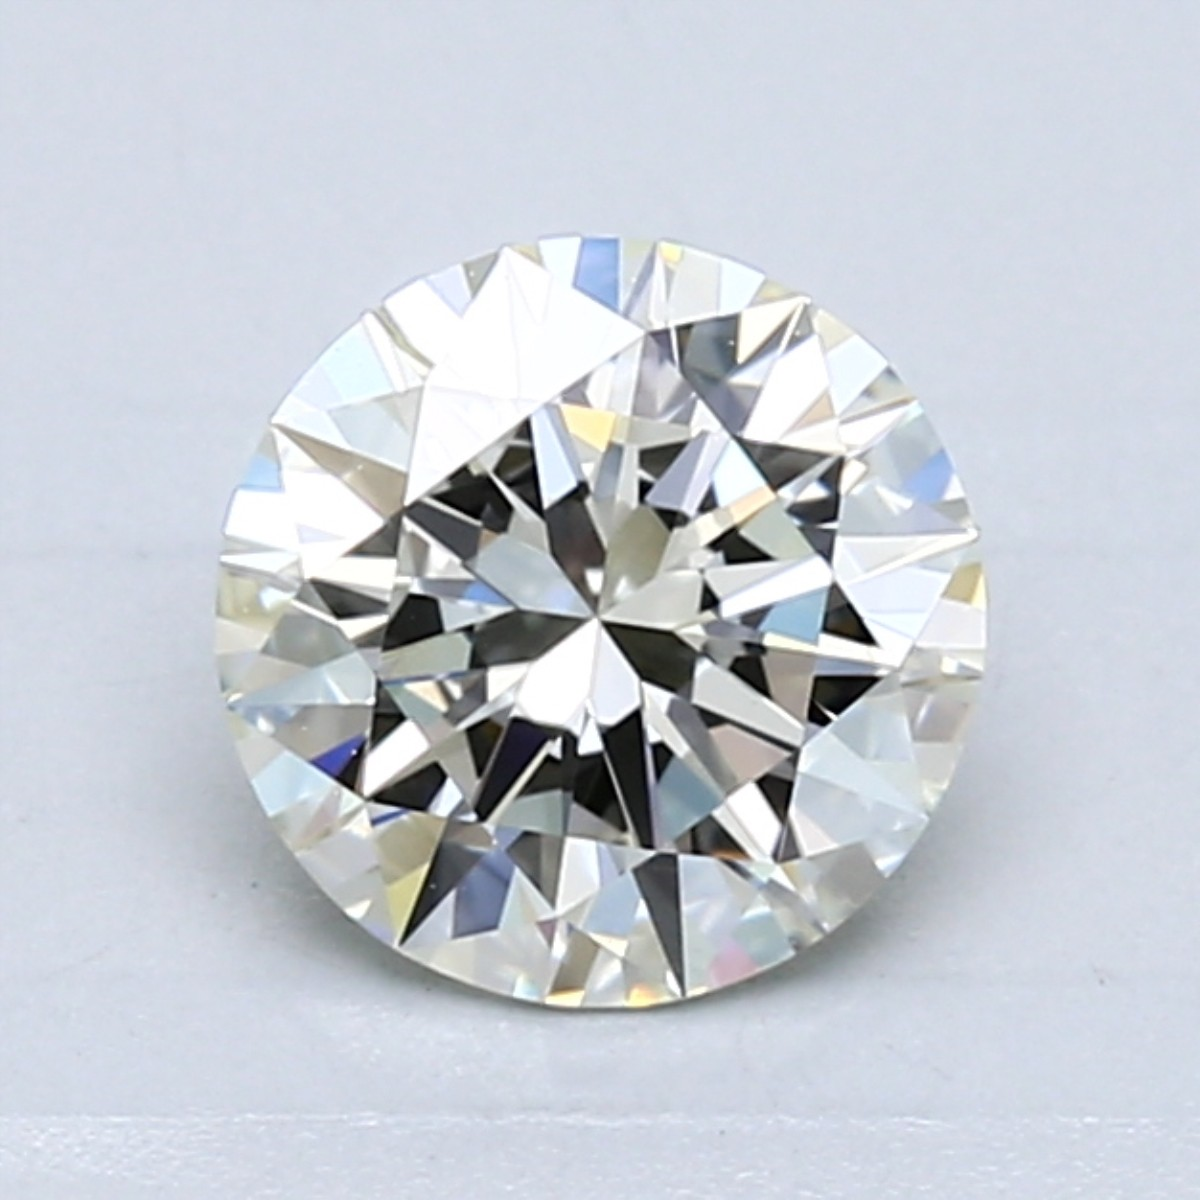 1.2 carat K VS1 with bad cut quality